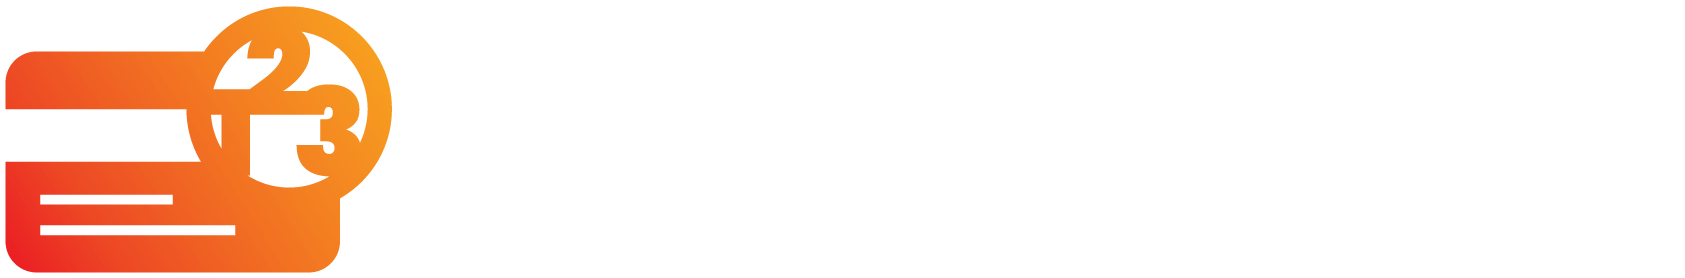 Creditcard123.nl